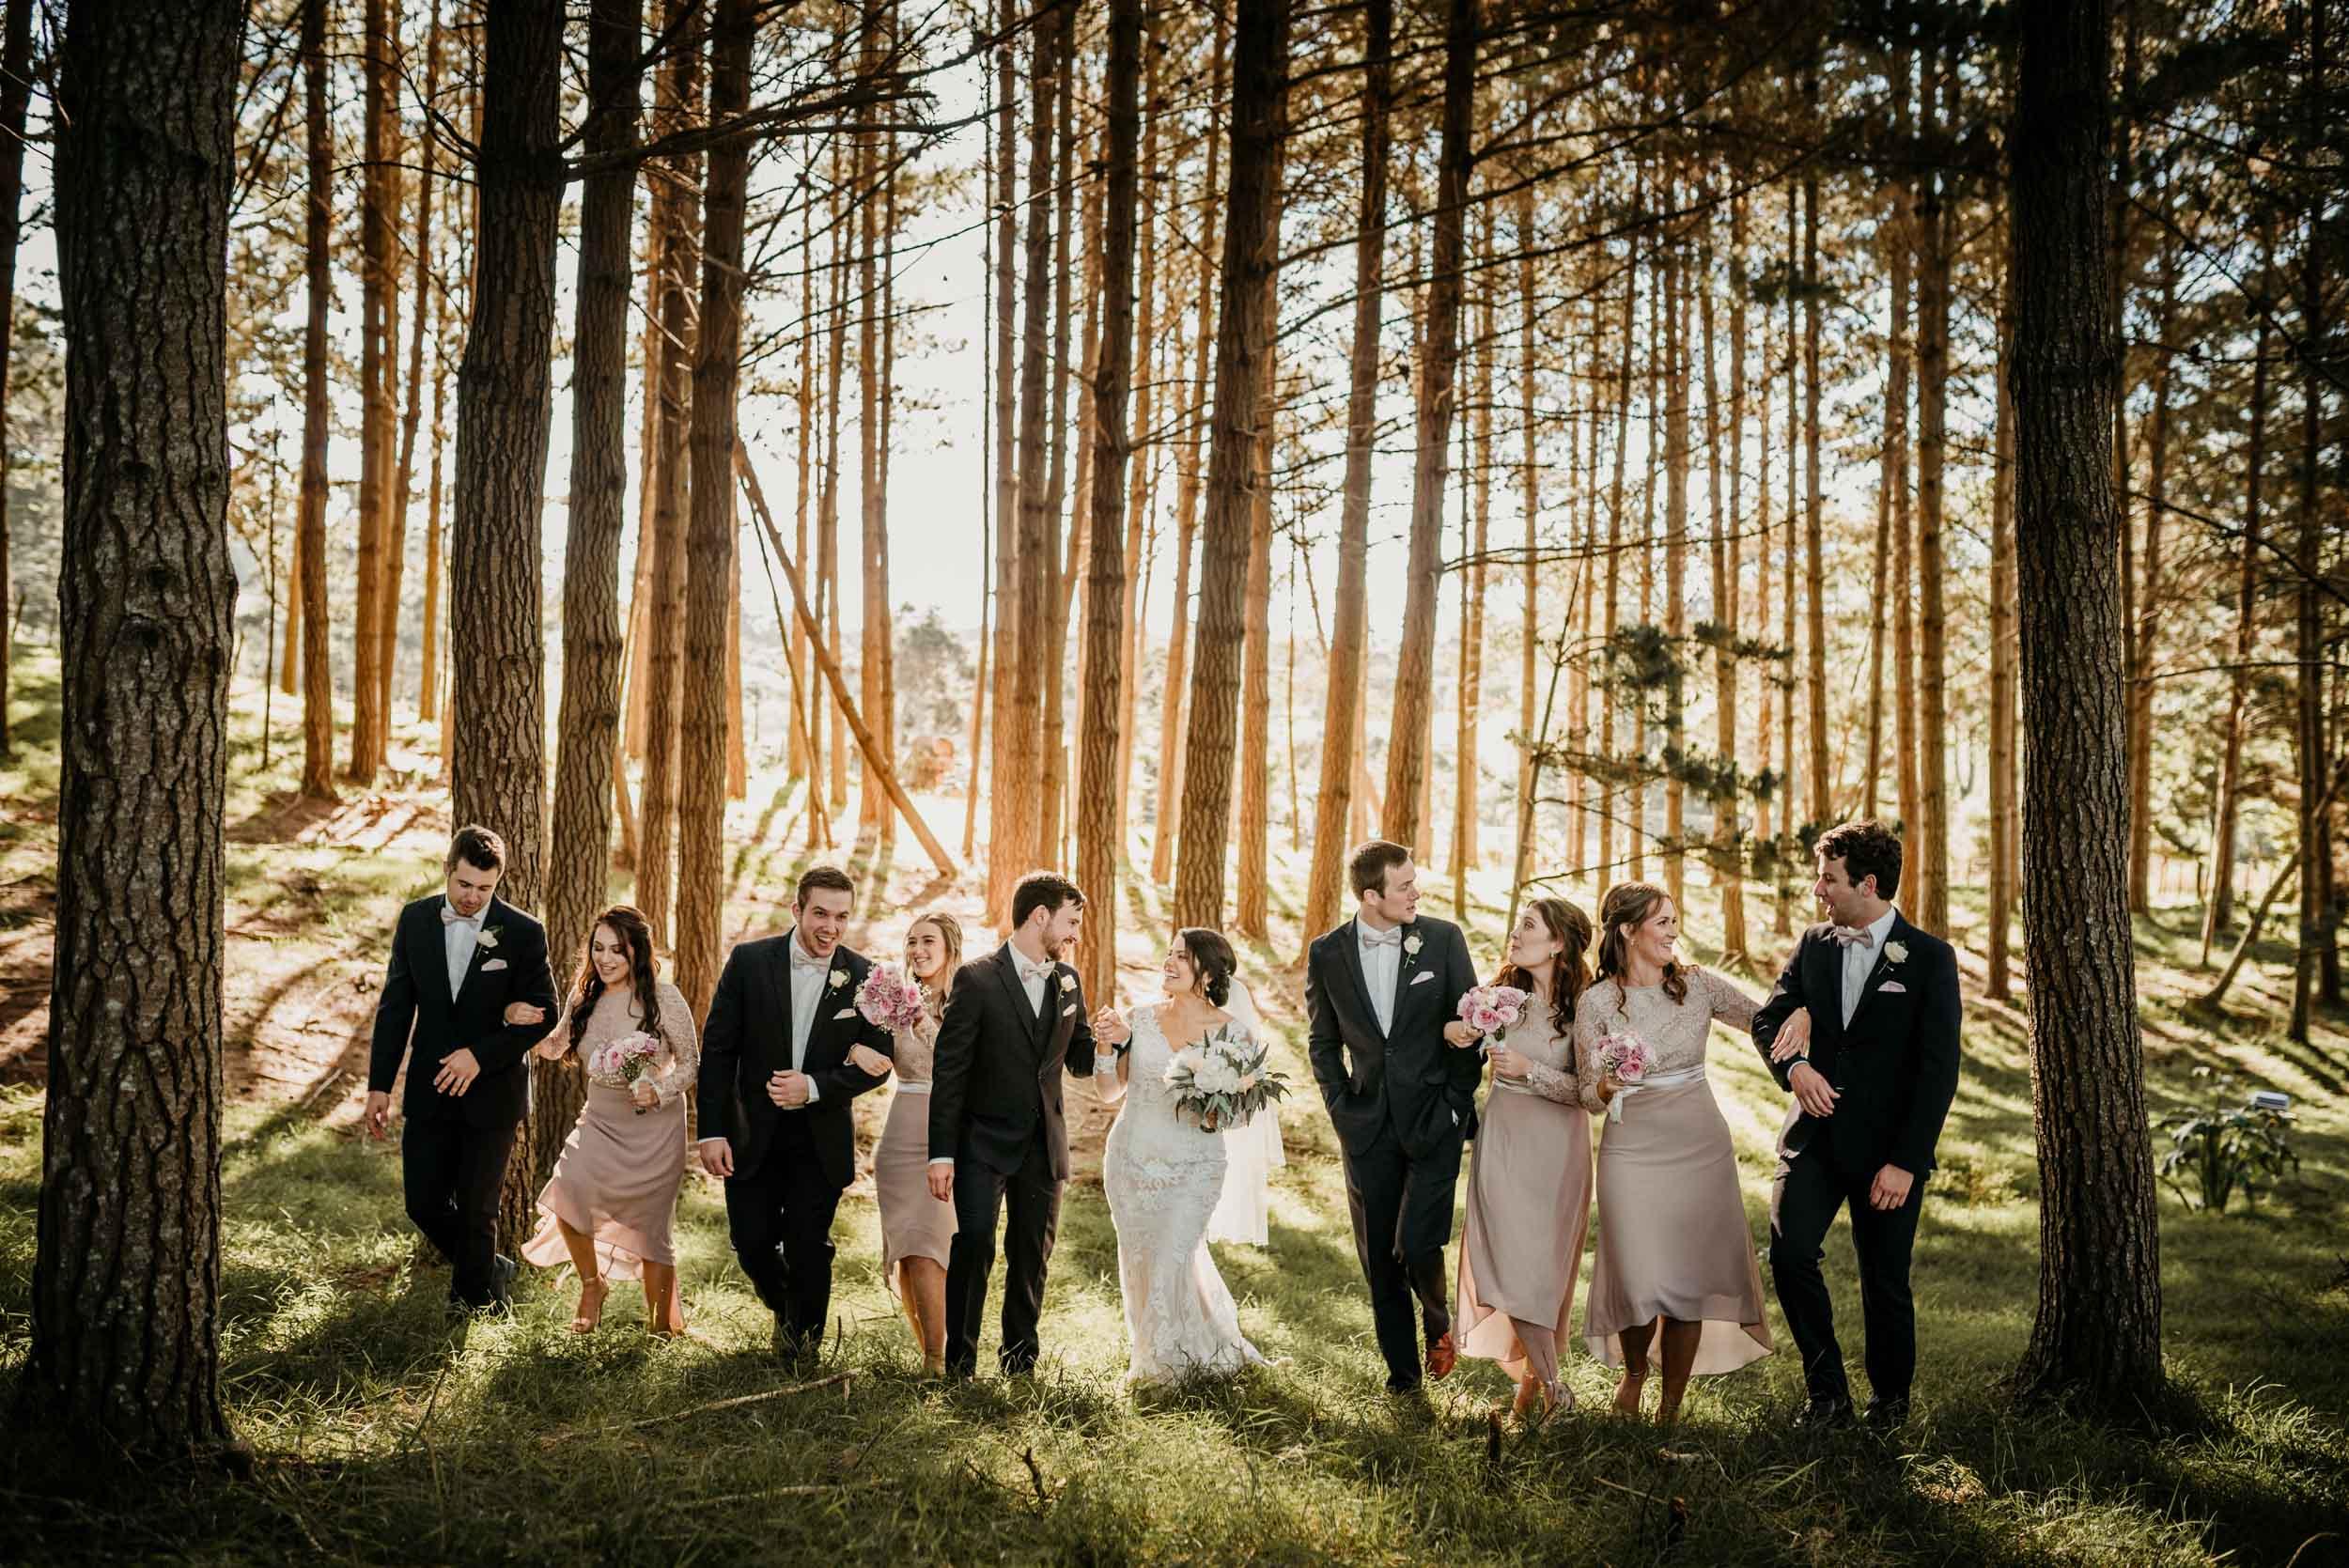 The Raw Photographer - Cairns Wedding Photographer - New Zealand Destination Photography - Travel - Australian-12.jpg